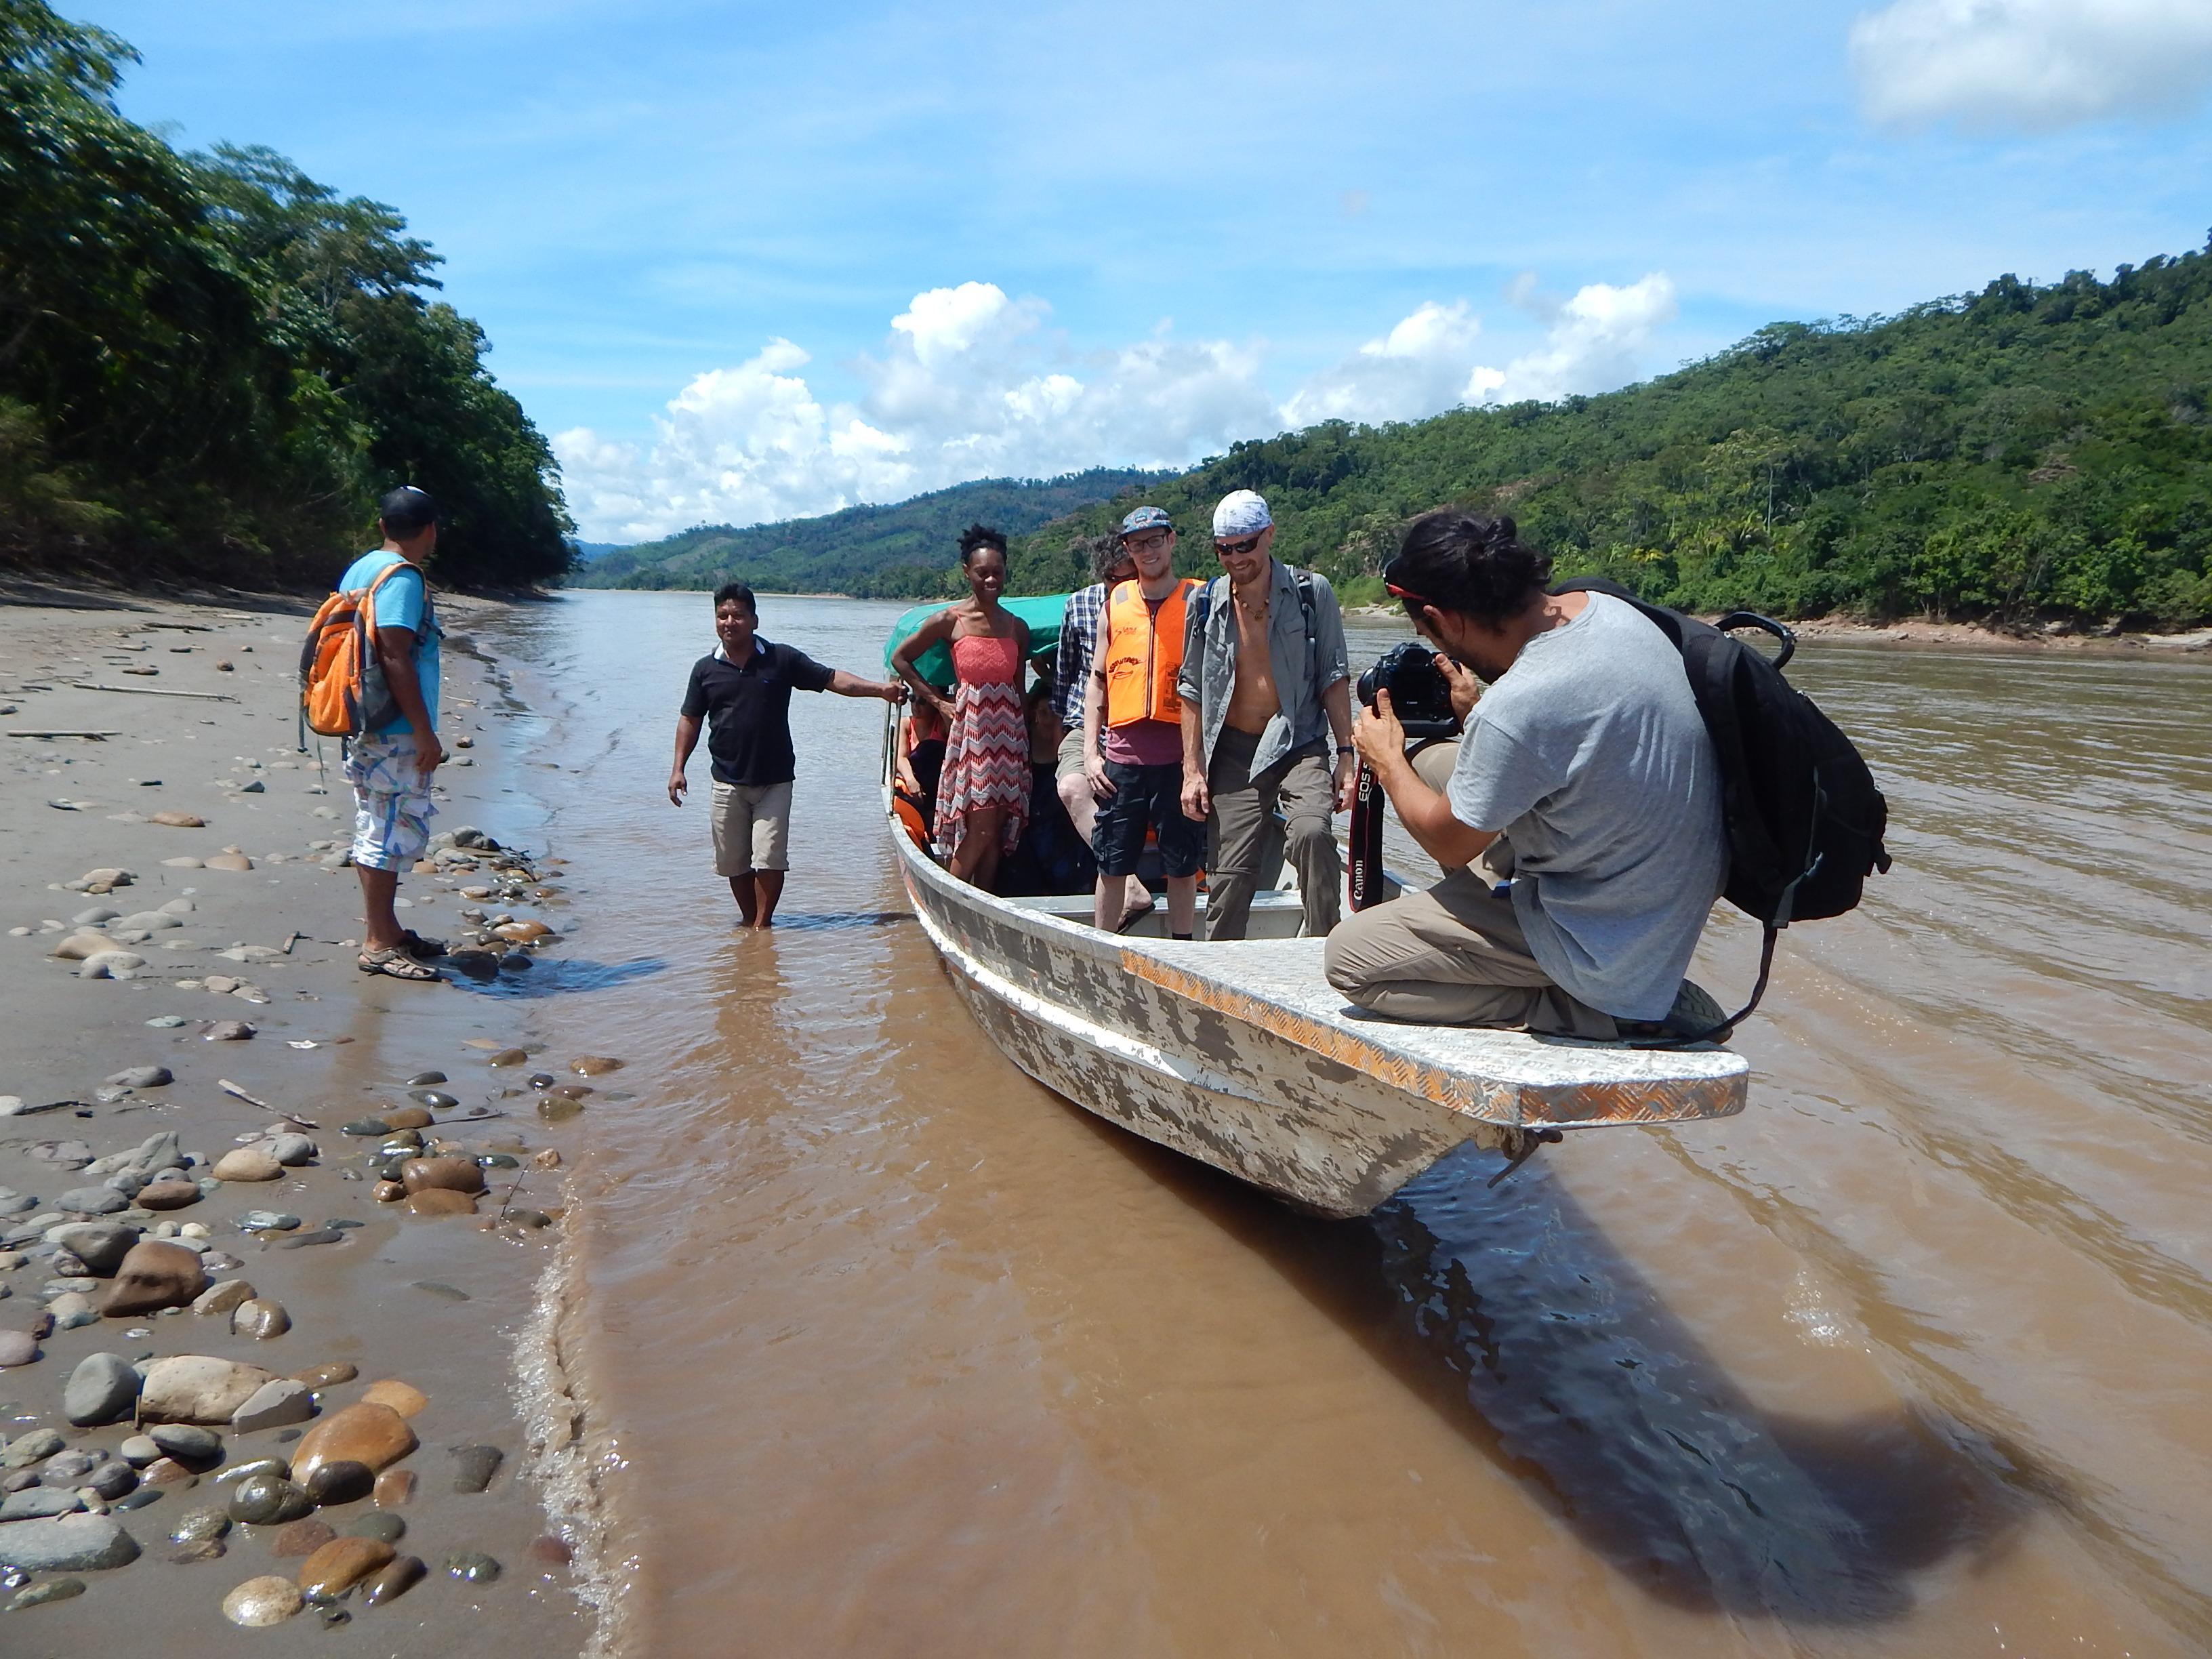 Amazon rainforest river trips | chocolate making courses | River Huallaga Chazuta